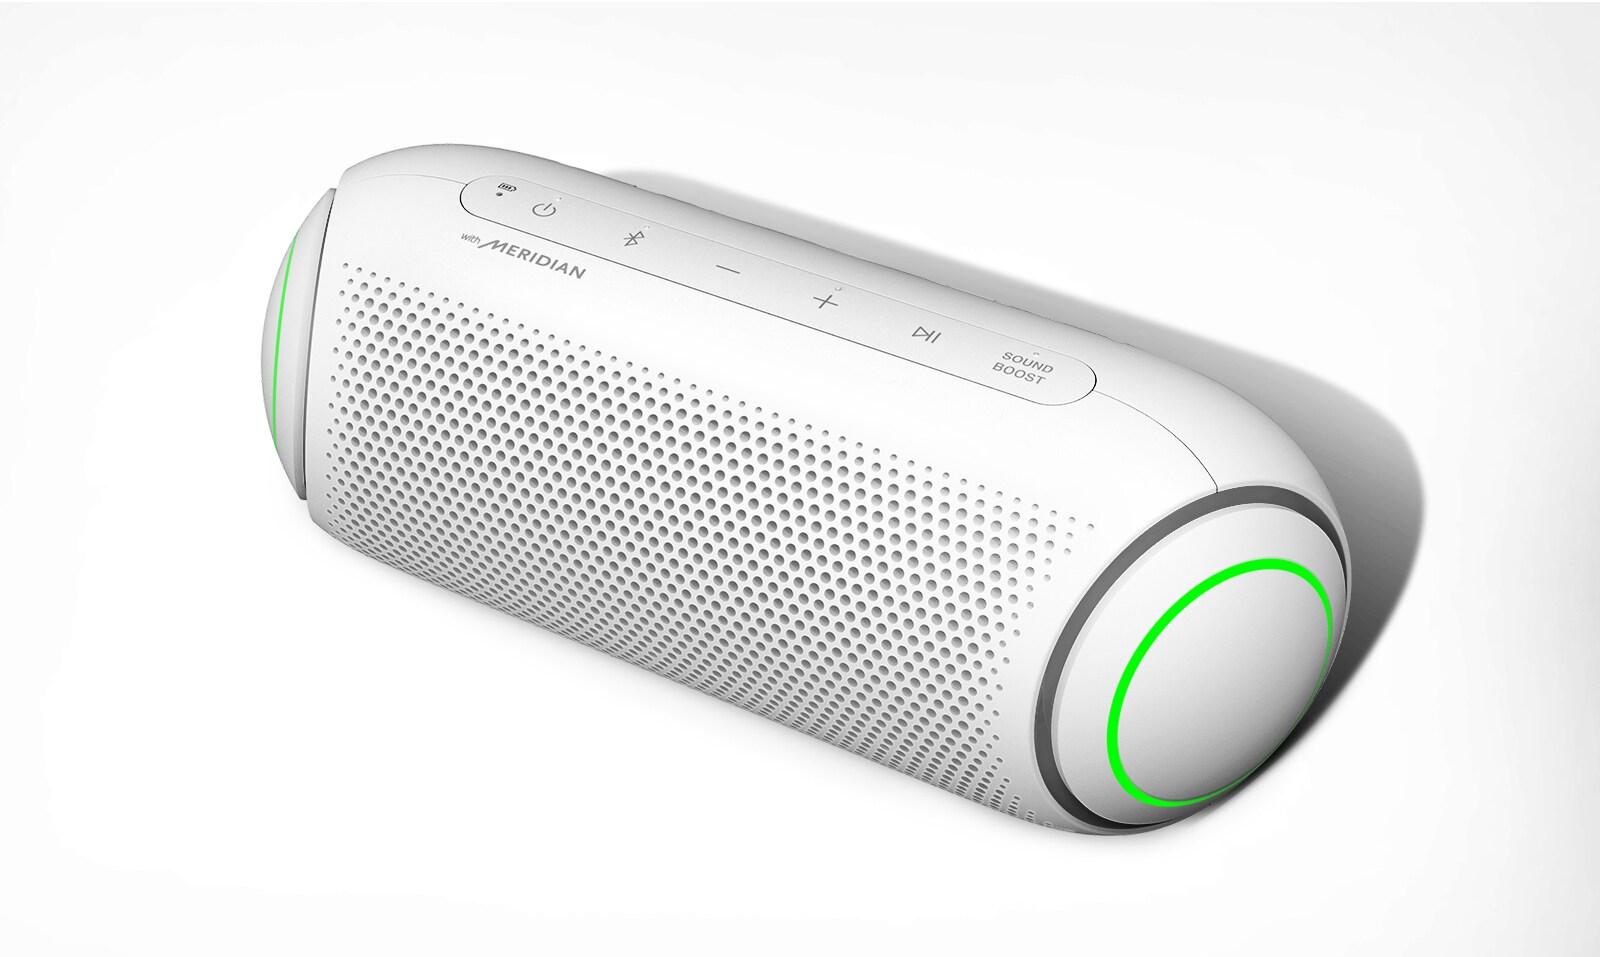 Na bijeloj se pozadini nalazi dijagonalni prikaz odozgo prema dolje prednje strane zvučnika LG XBOOM Go sa zelenim osvjetljenjem.